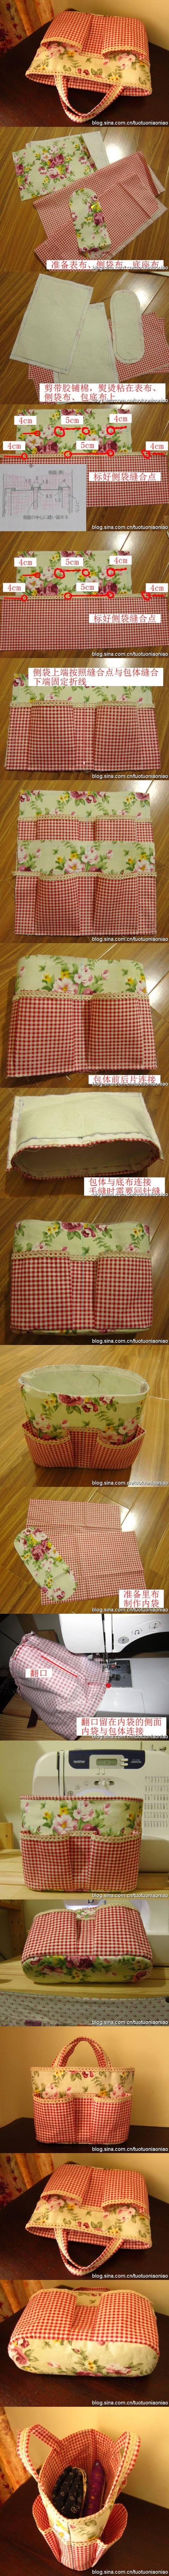 DIY Shop Bags